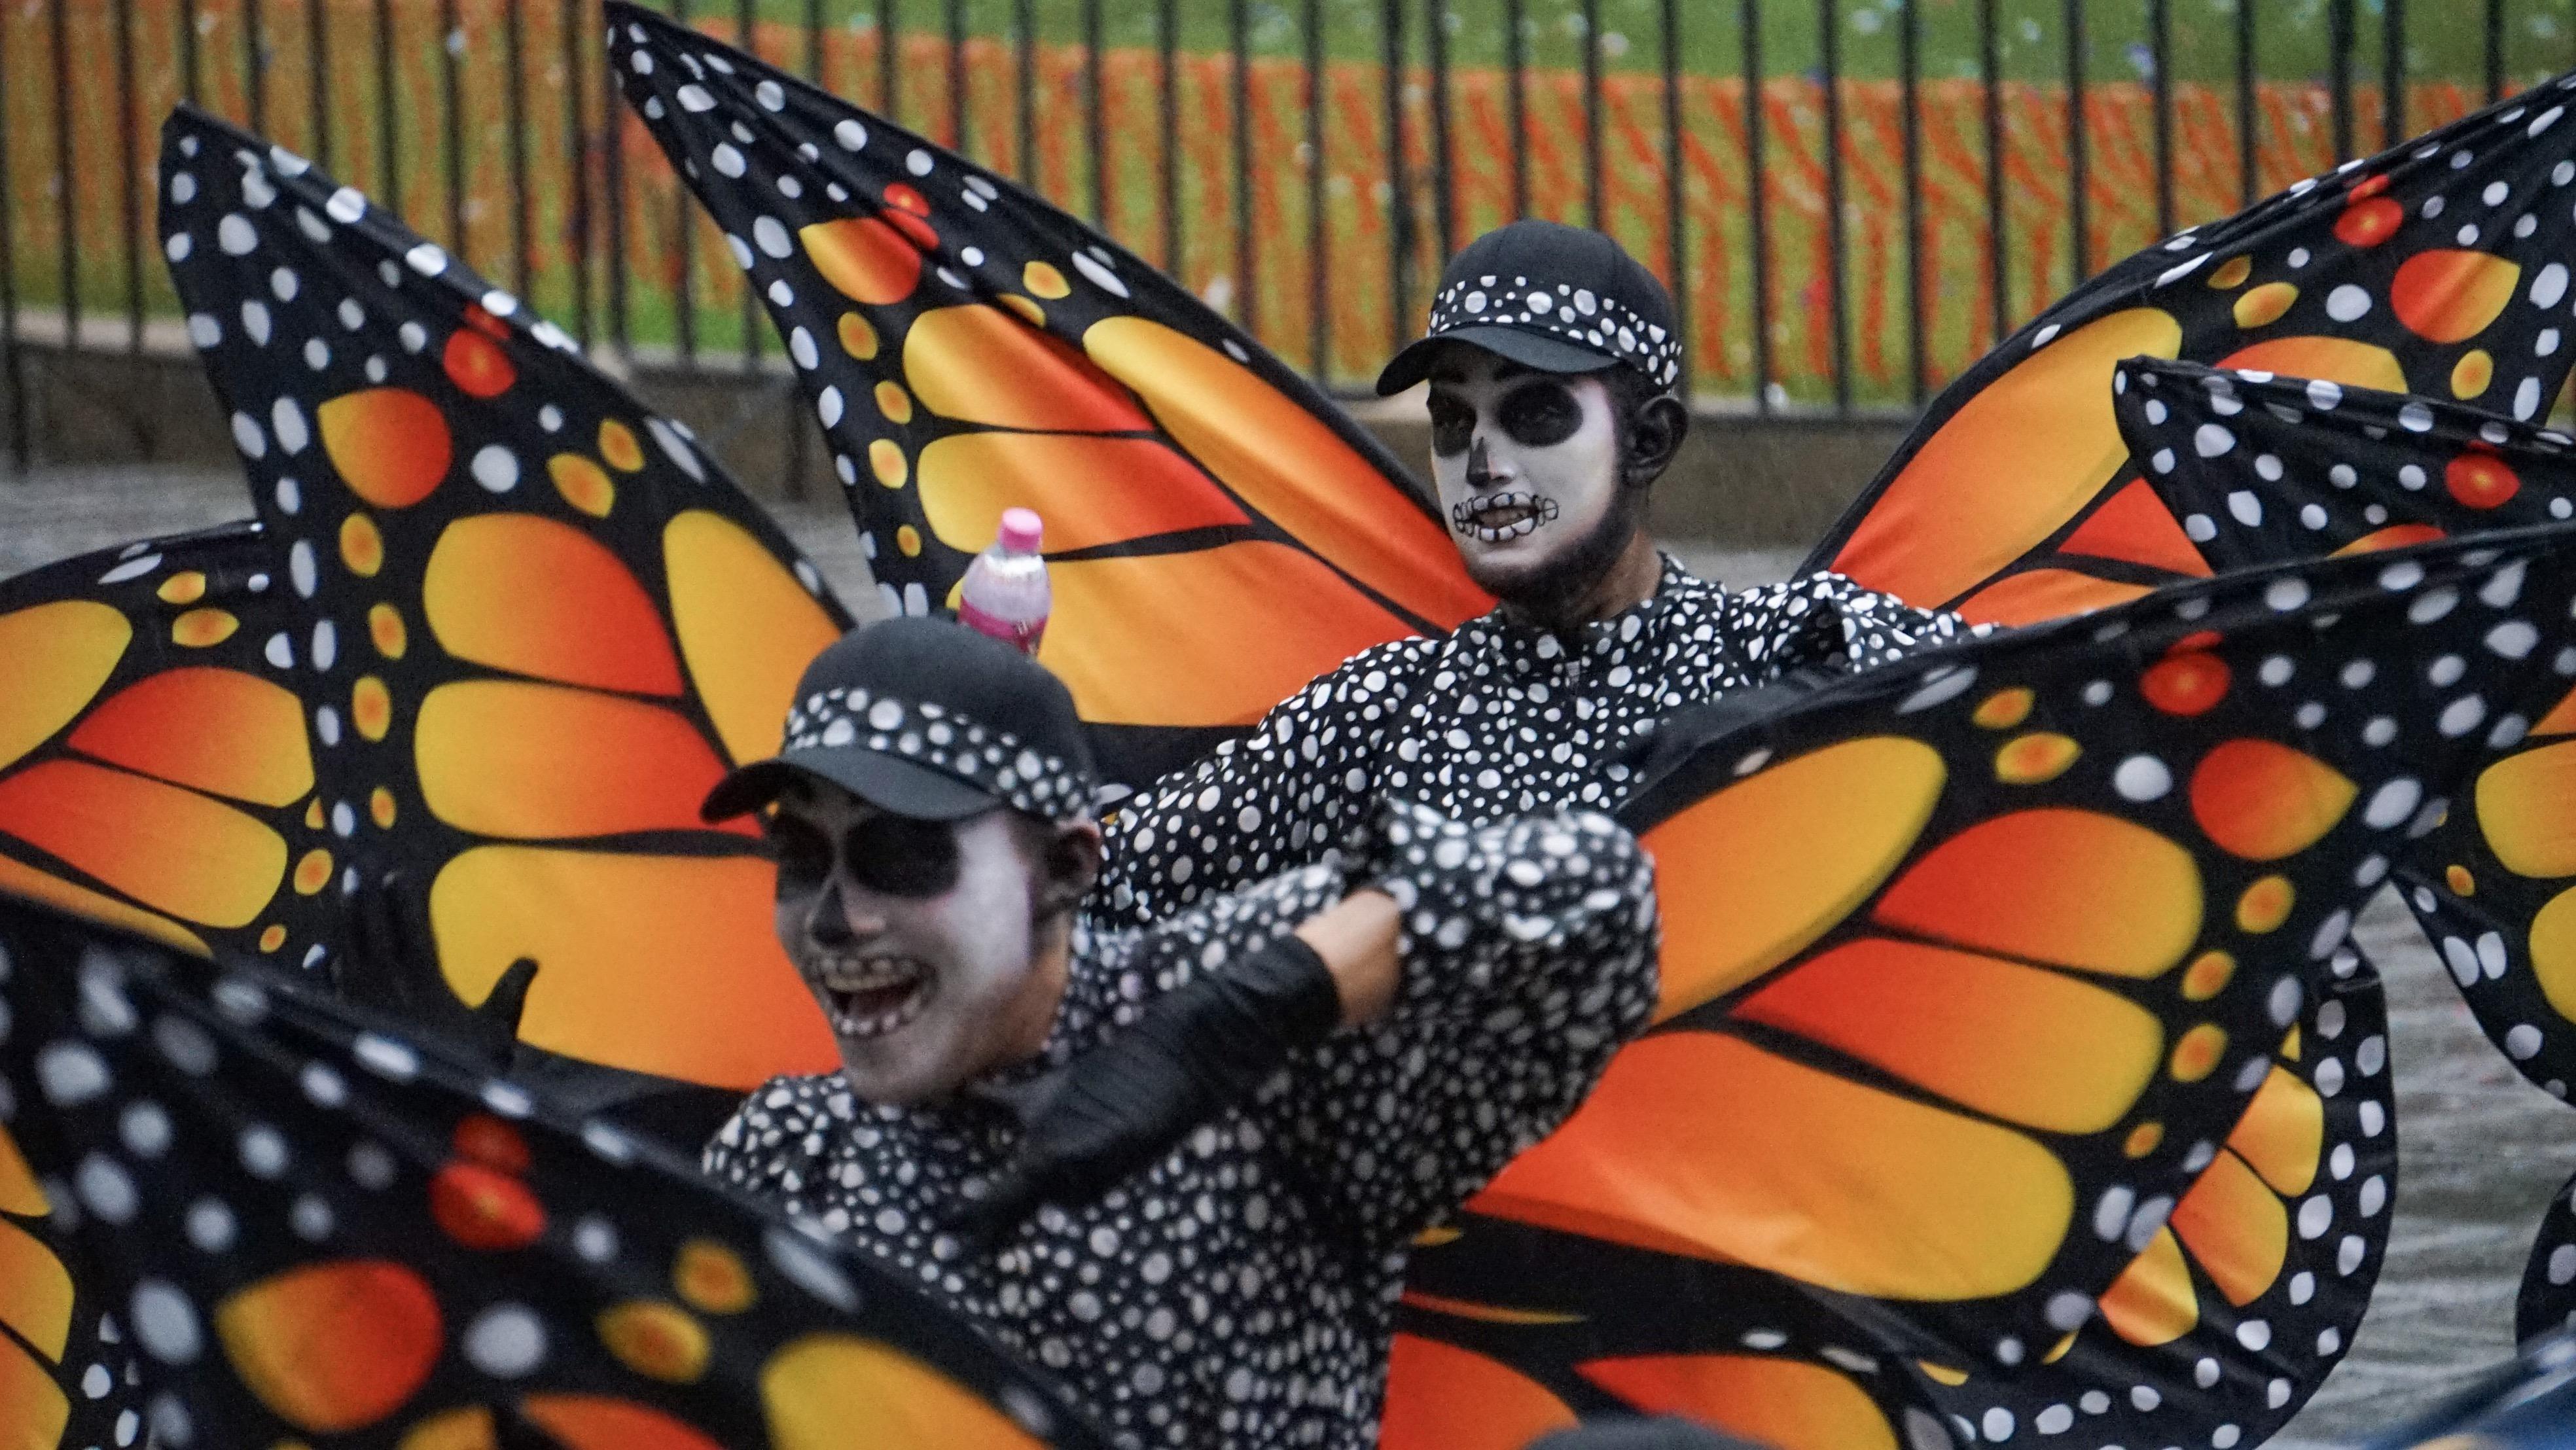 Las mariposas monarcas son un símbolo de México gracias a que se han convertido en un atractivo turístico